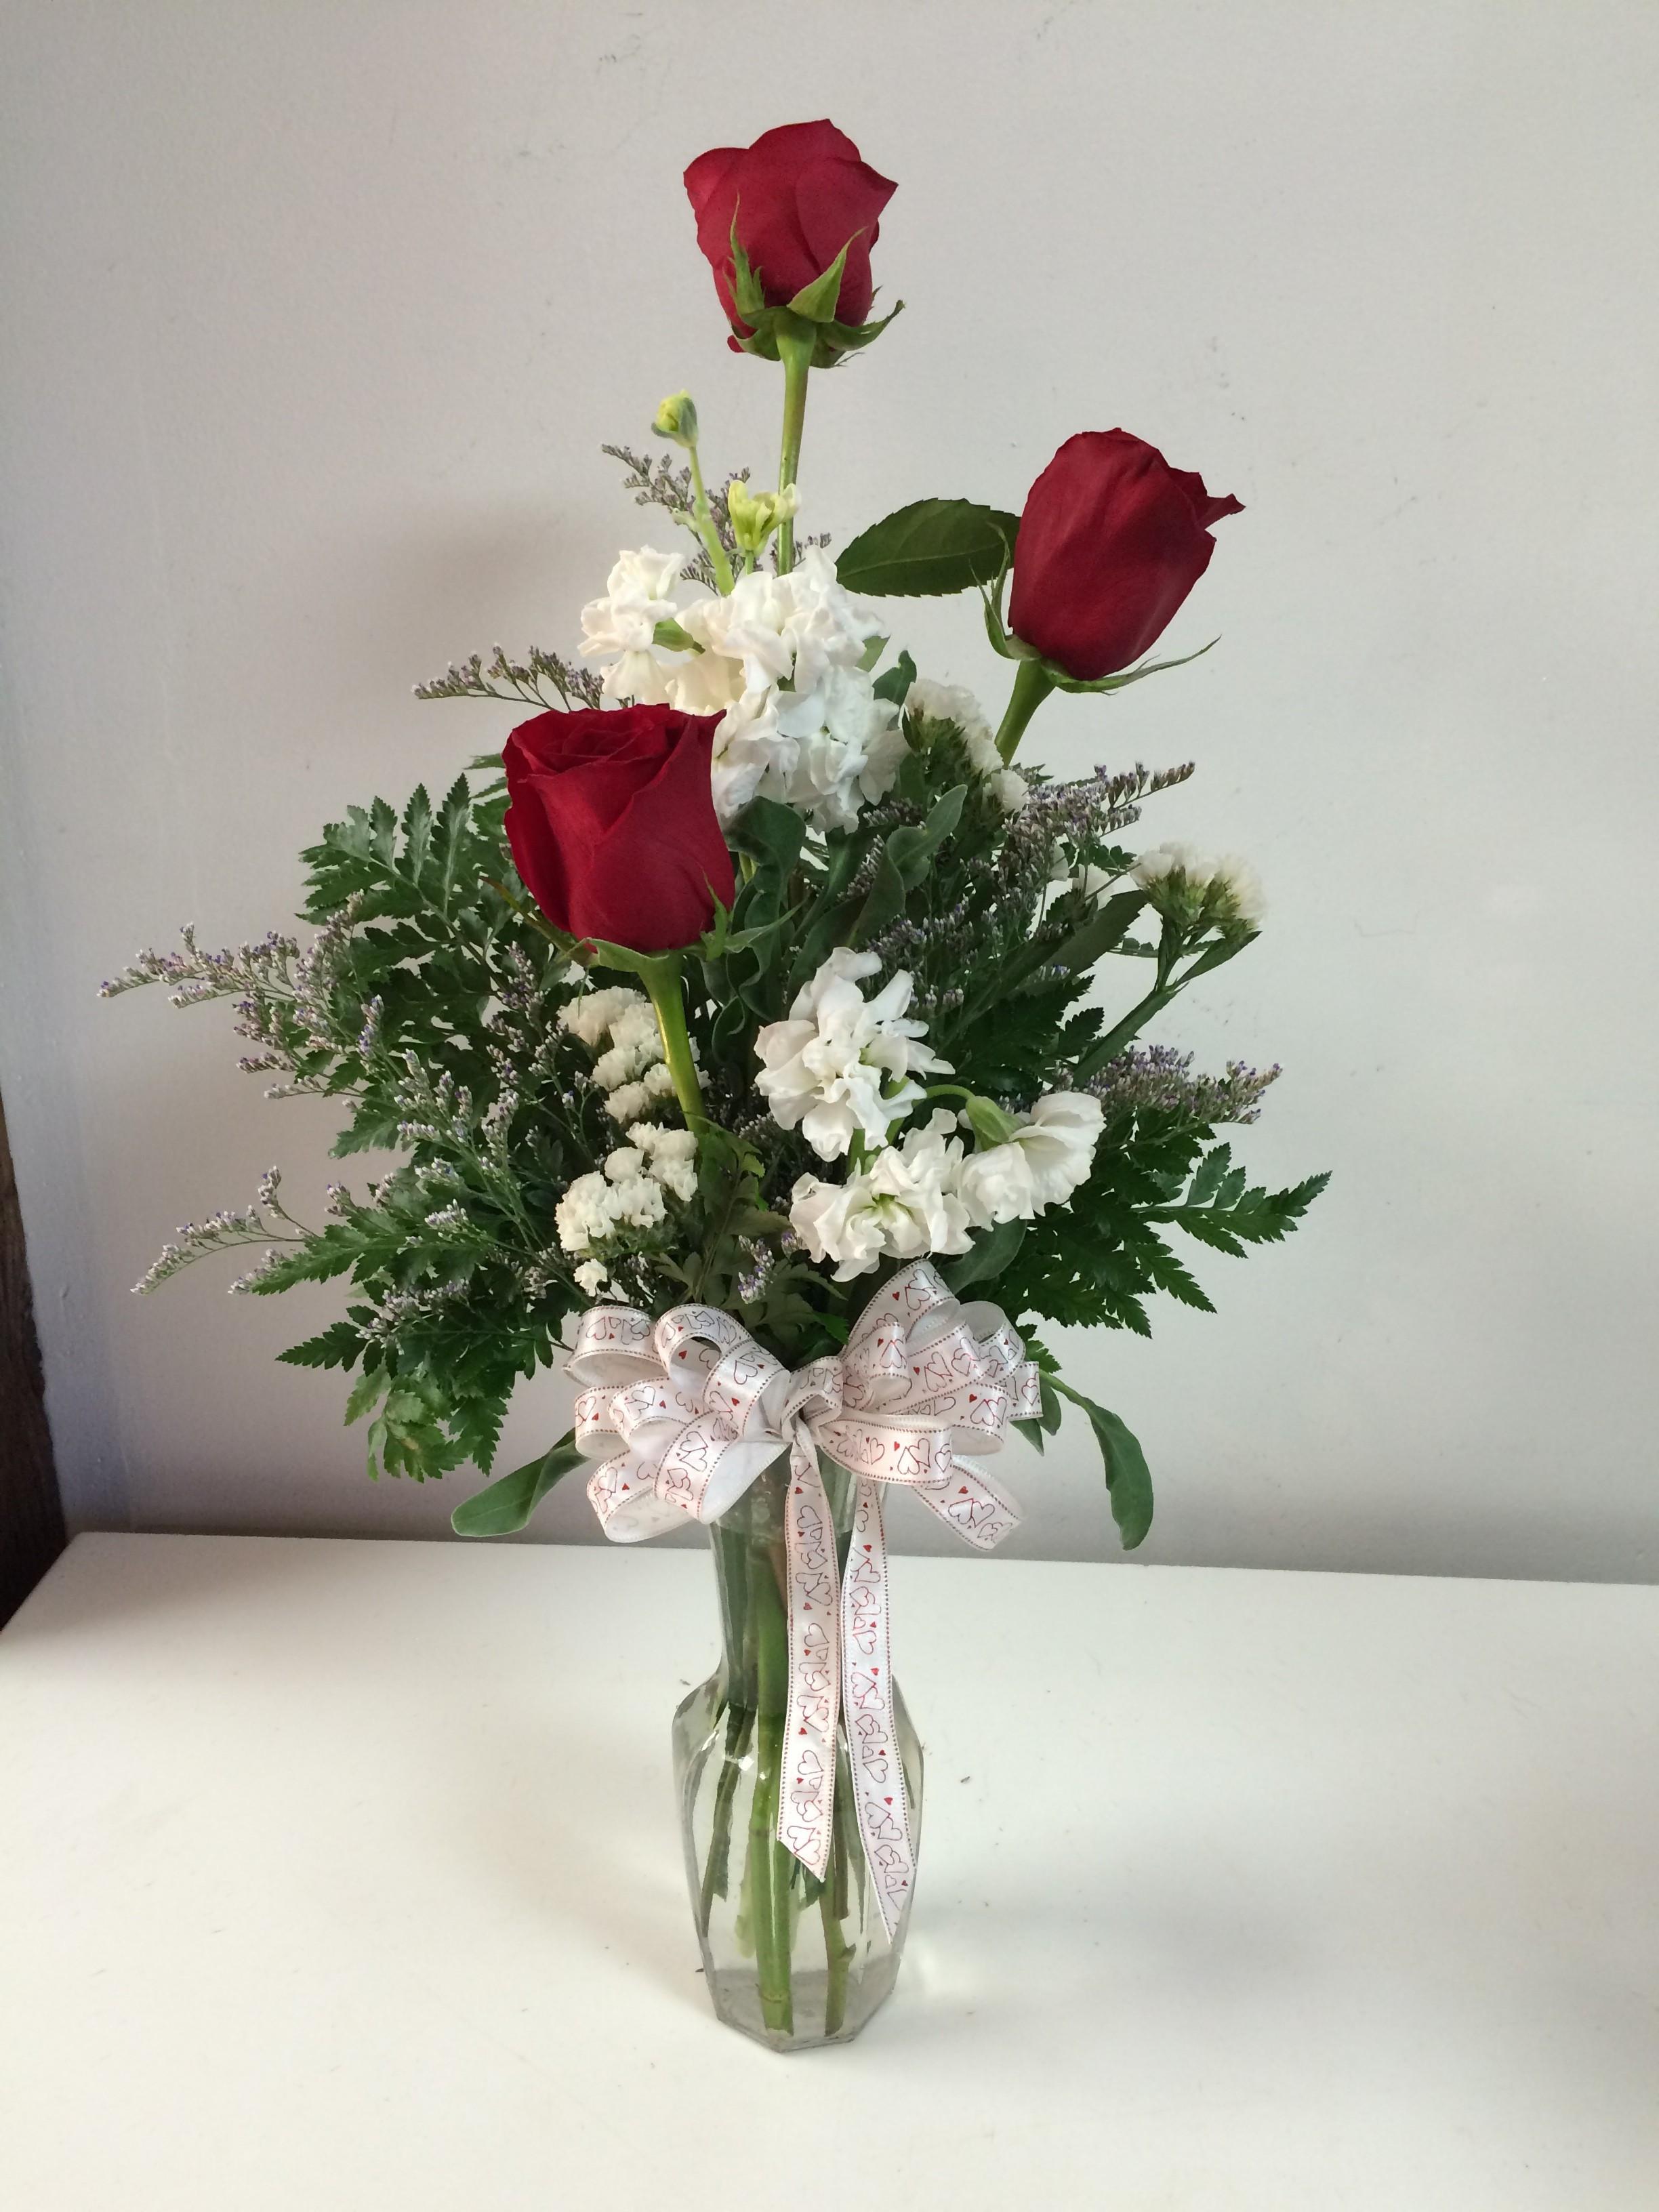 Triple roses